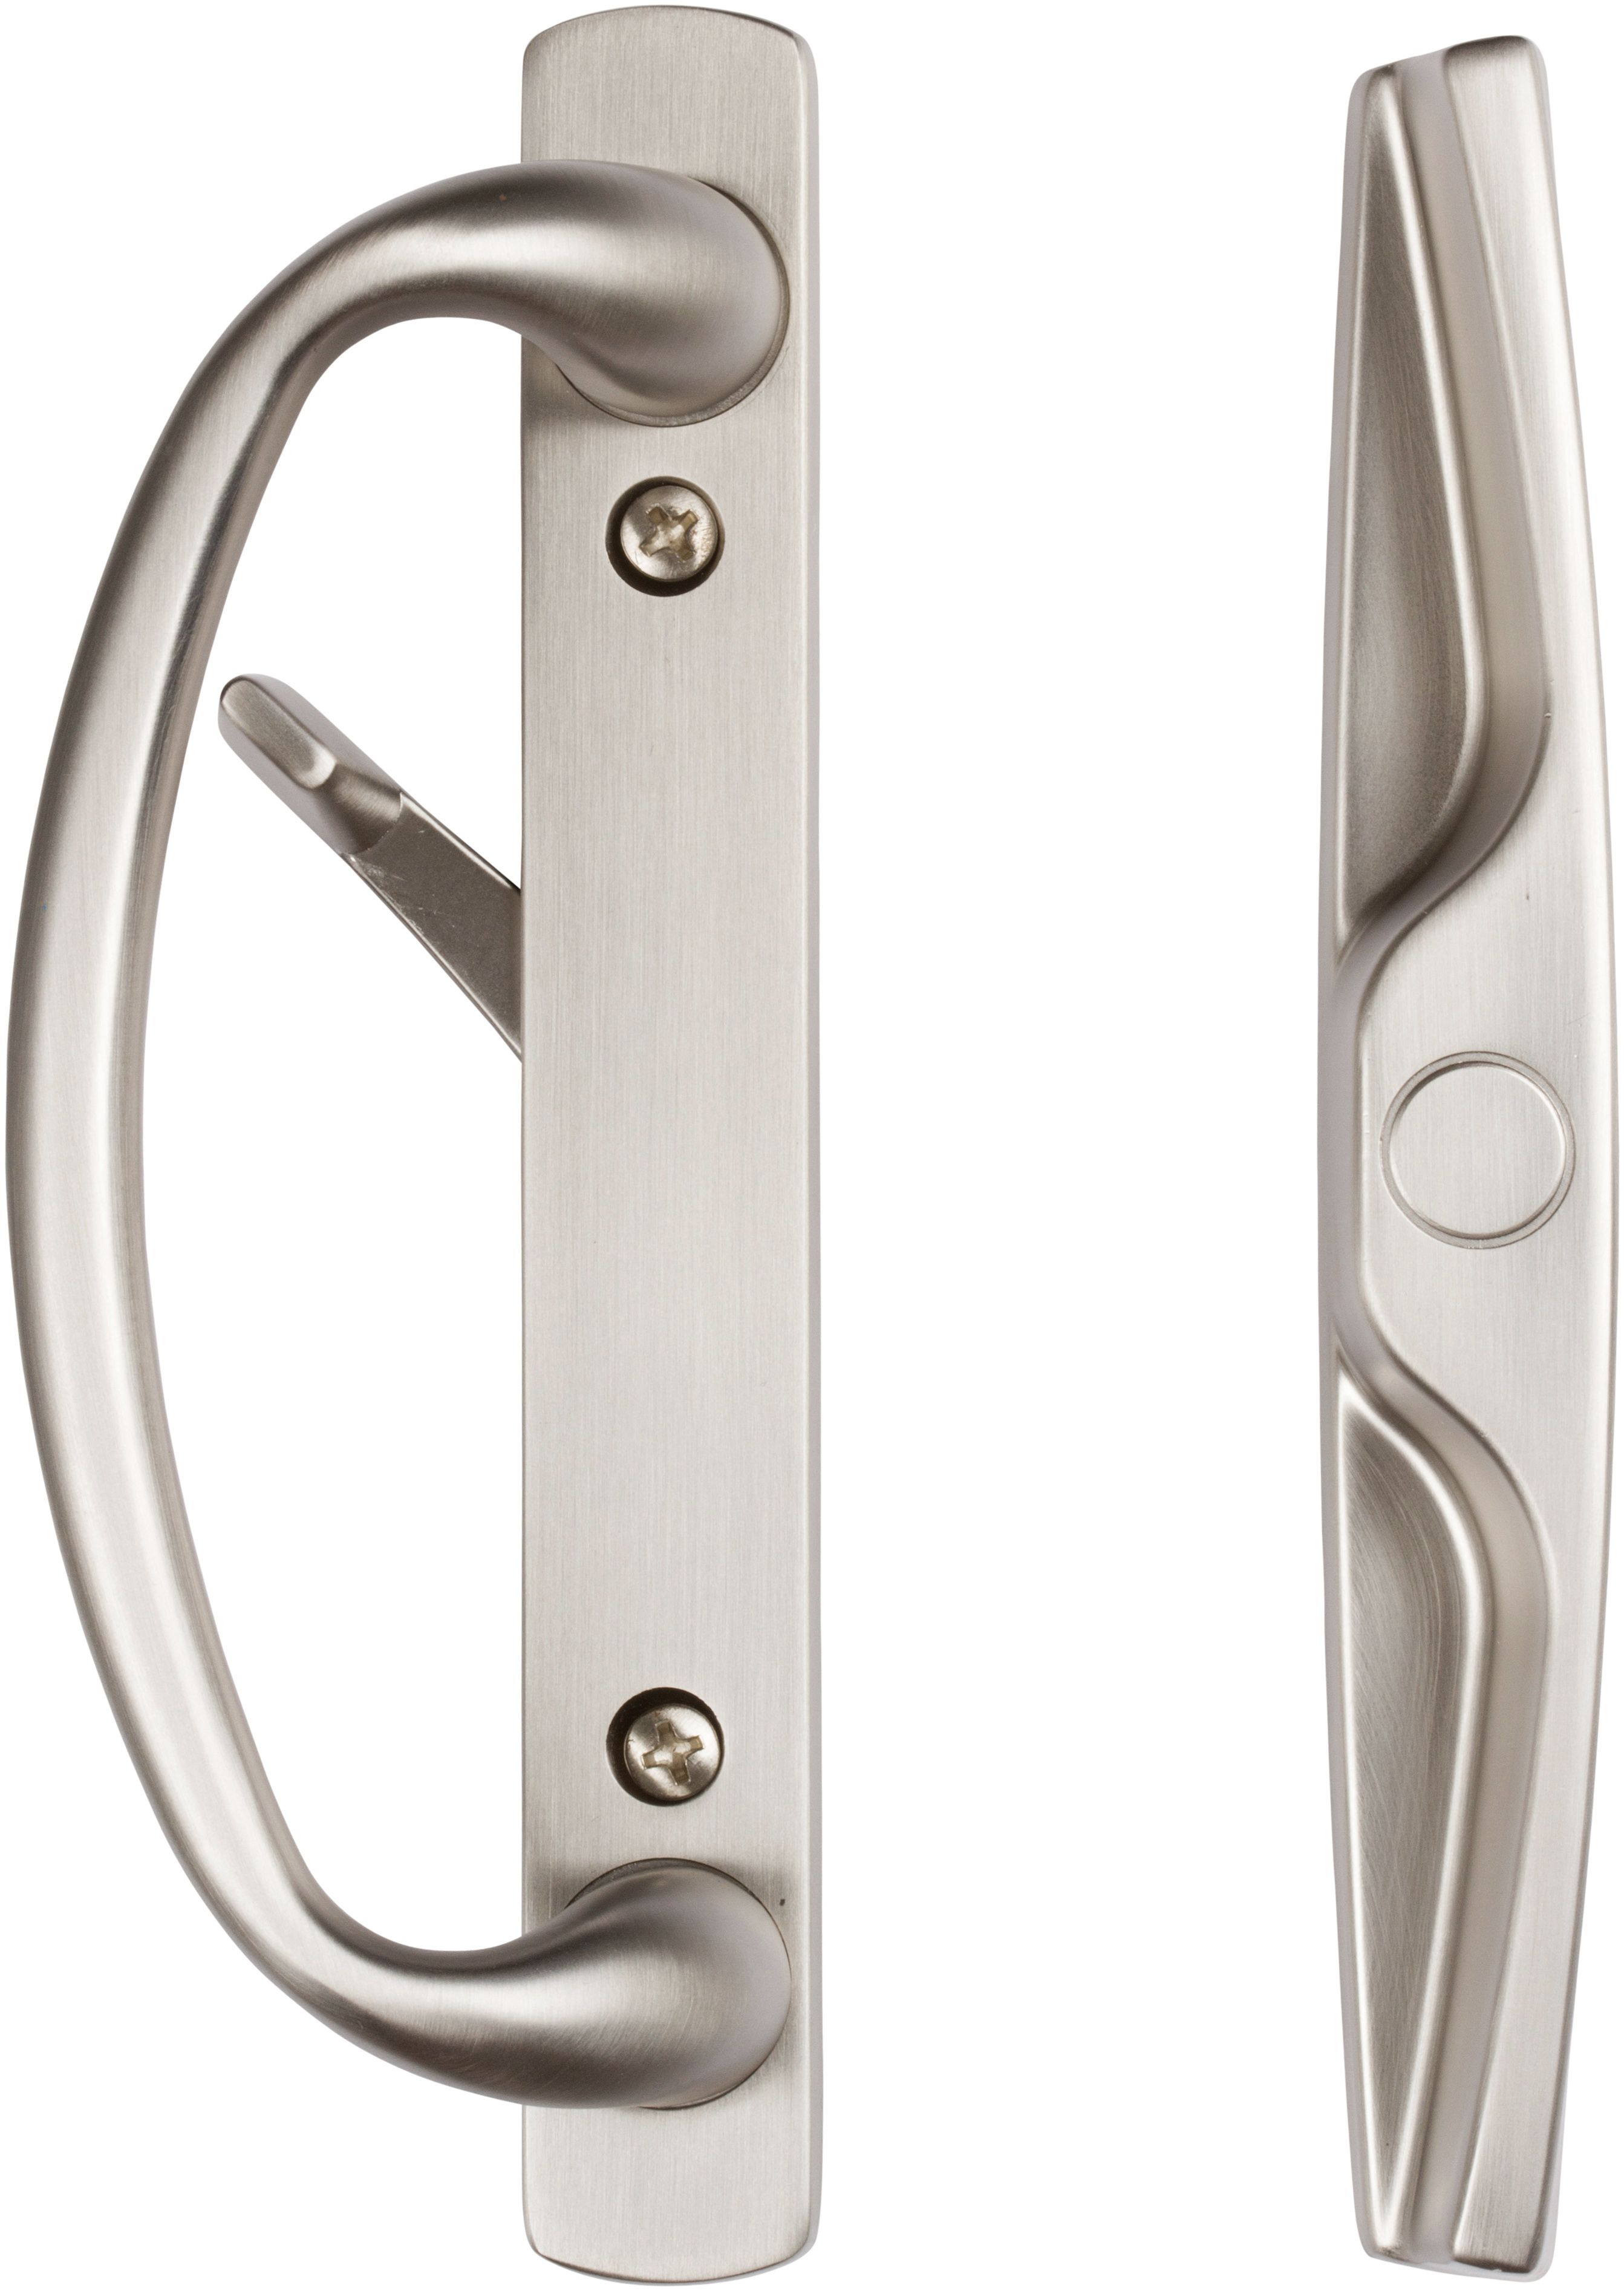 rockwell euro charlotte sliding door handle set in brushed nickel